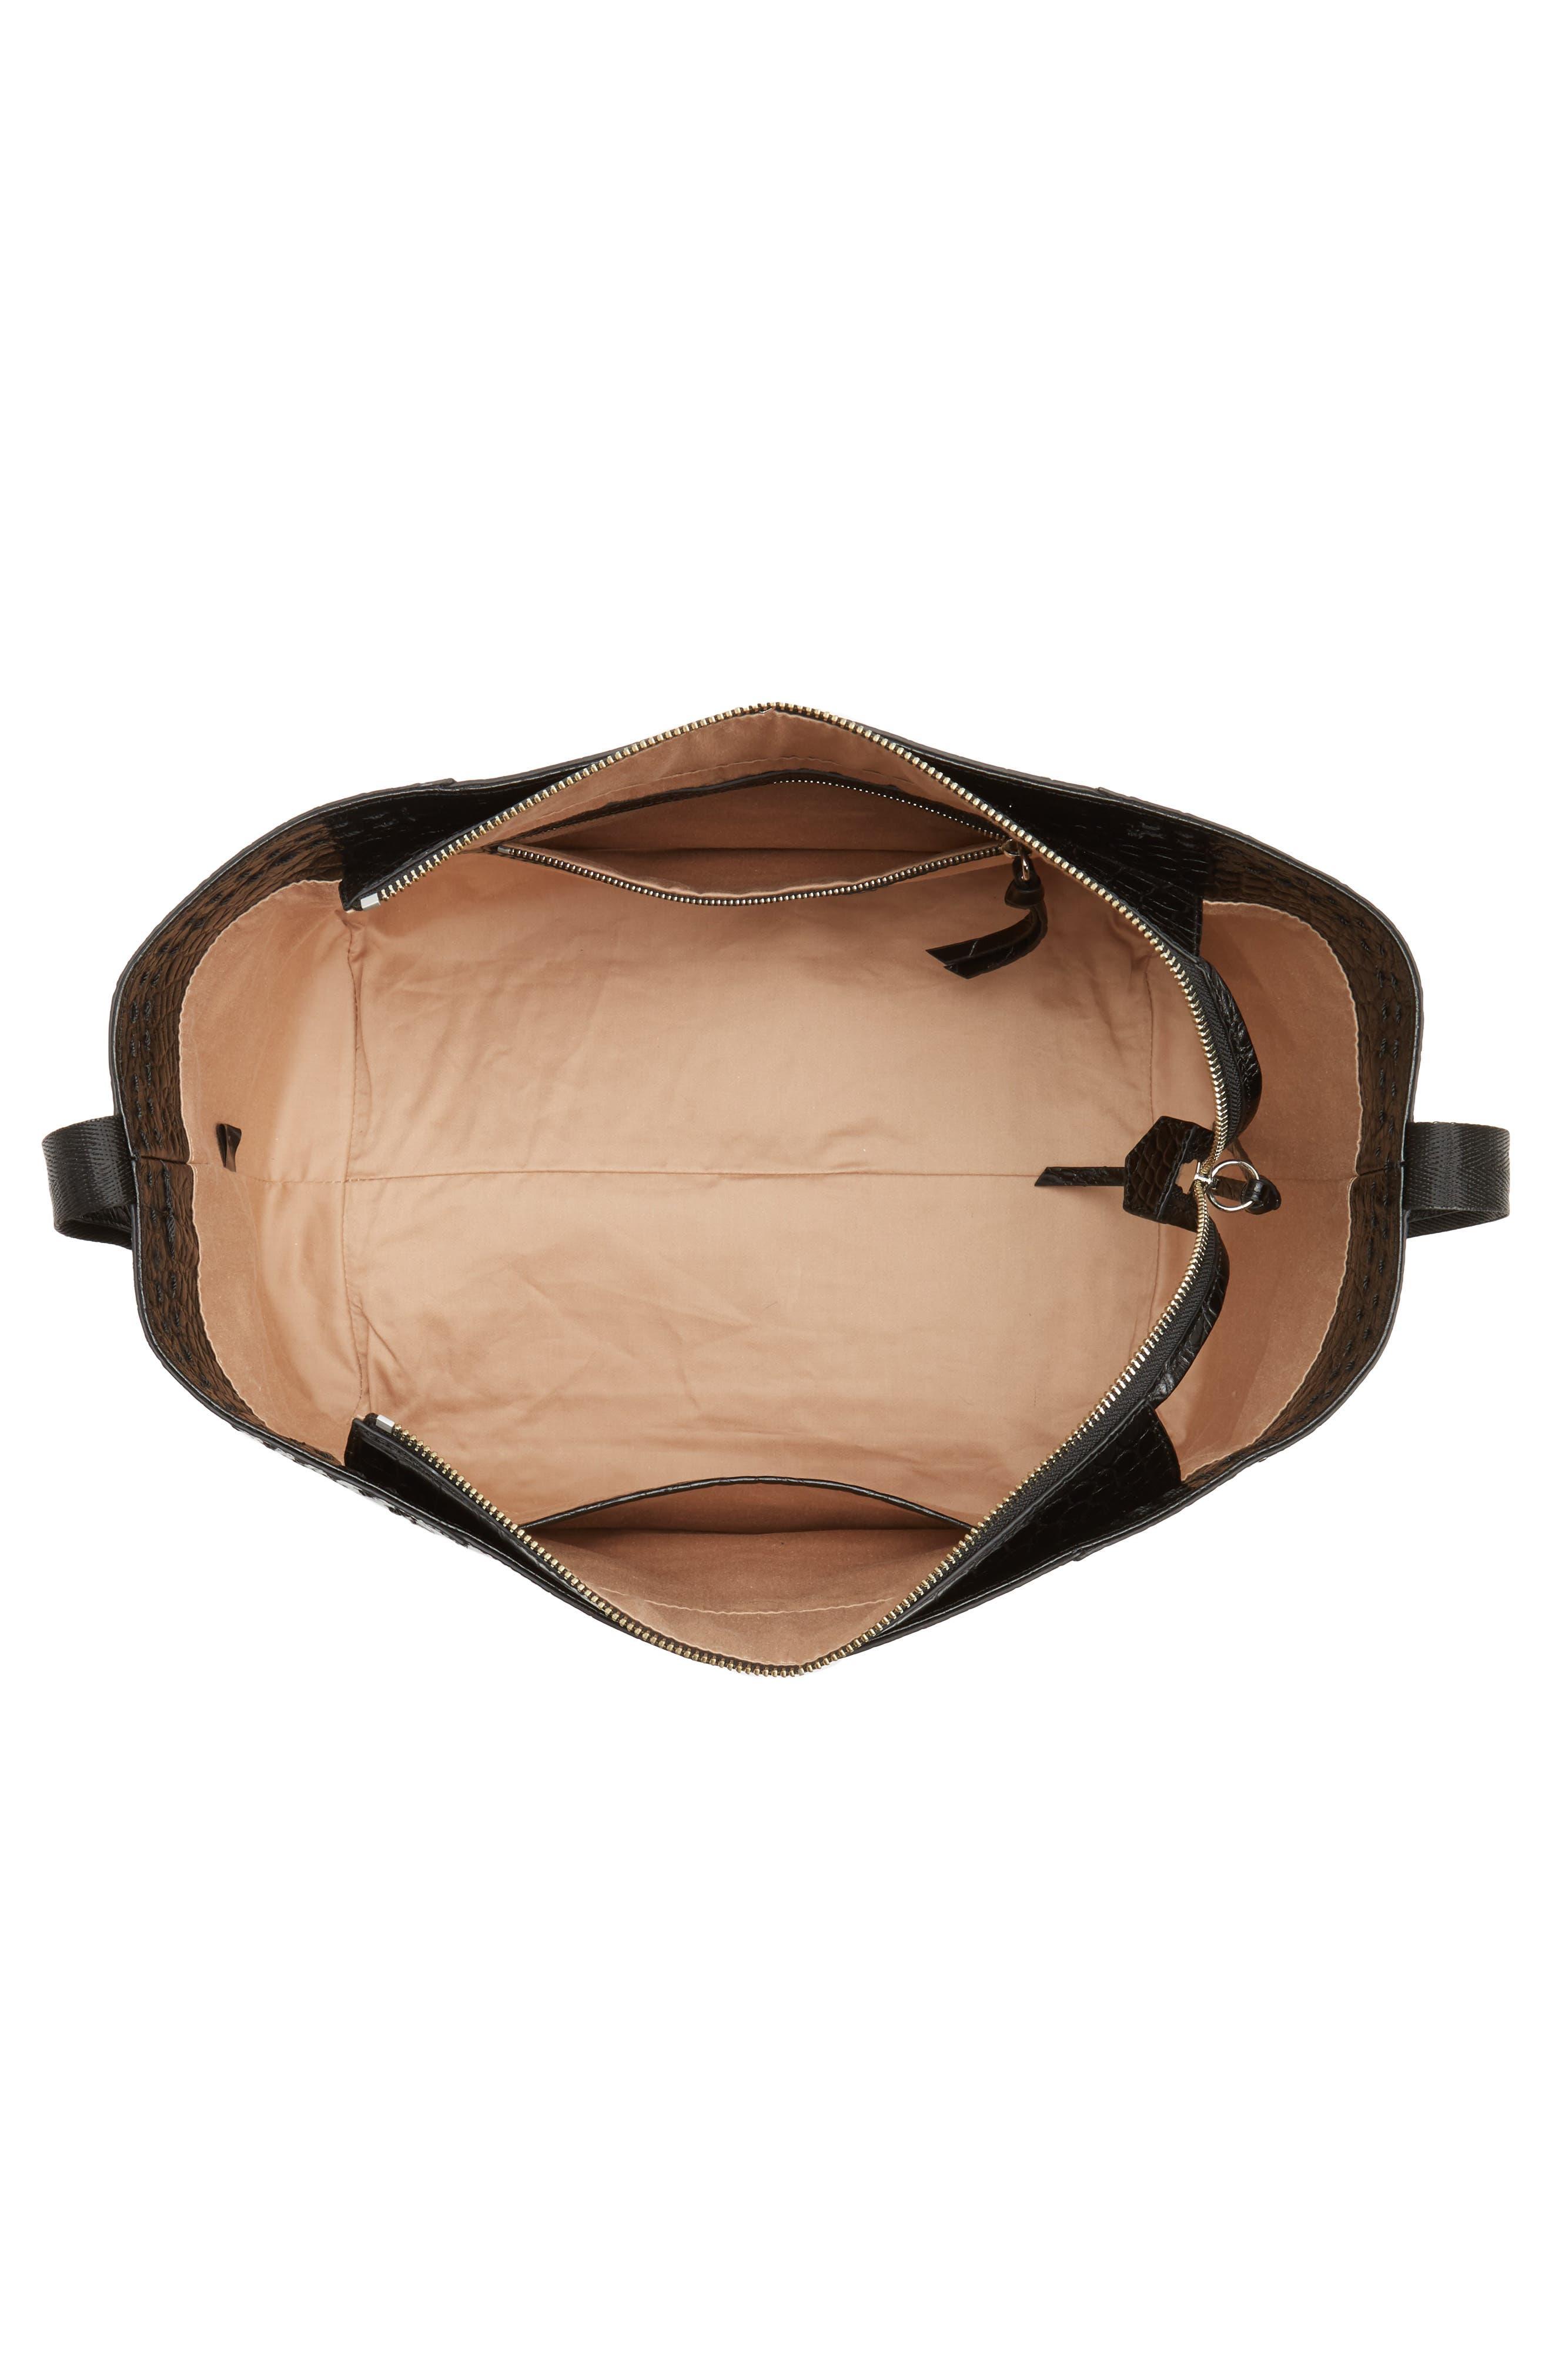 Mini Keely Newspaper Croc Embossed Leather Shoulder/Crossbody Bag,                             Alternate thumbnail 4, color,                             001